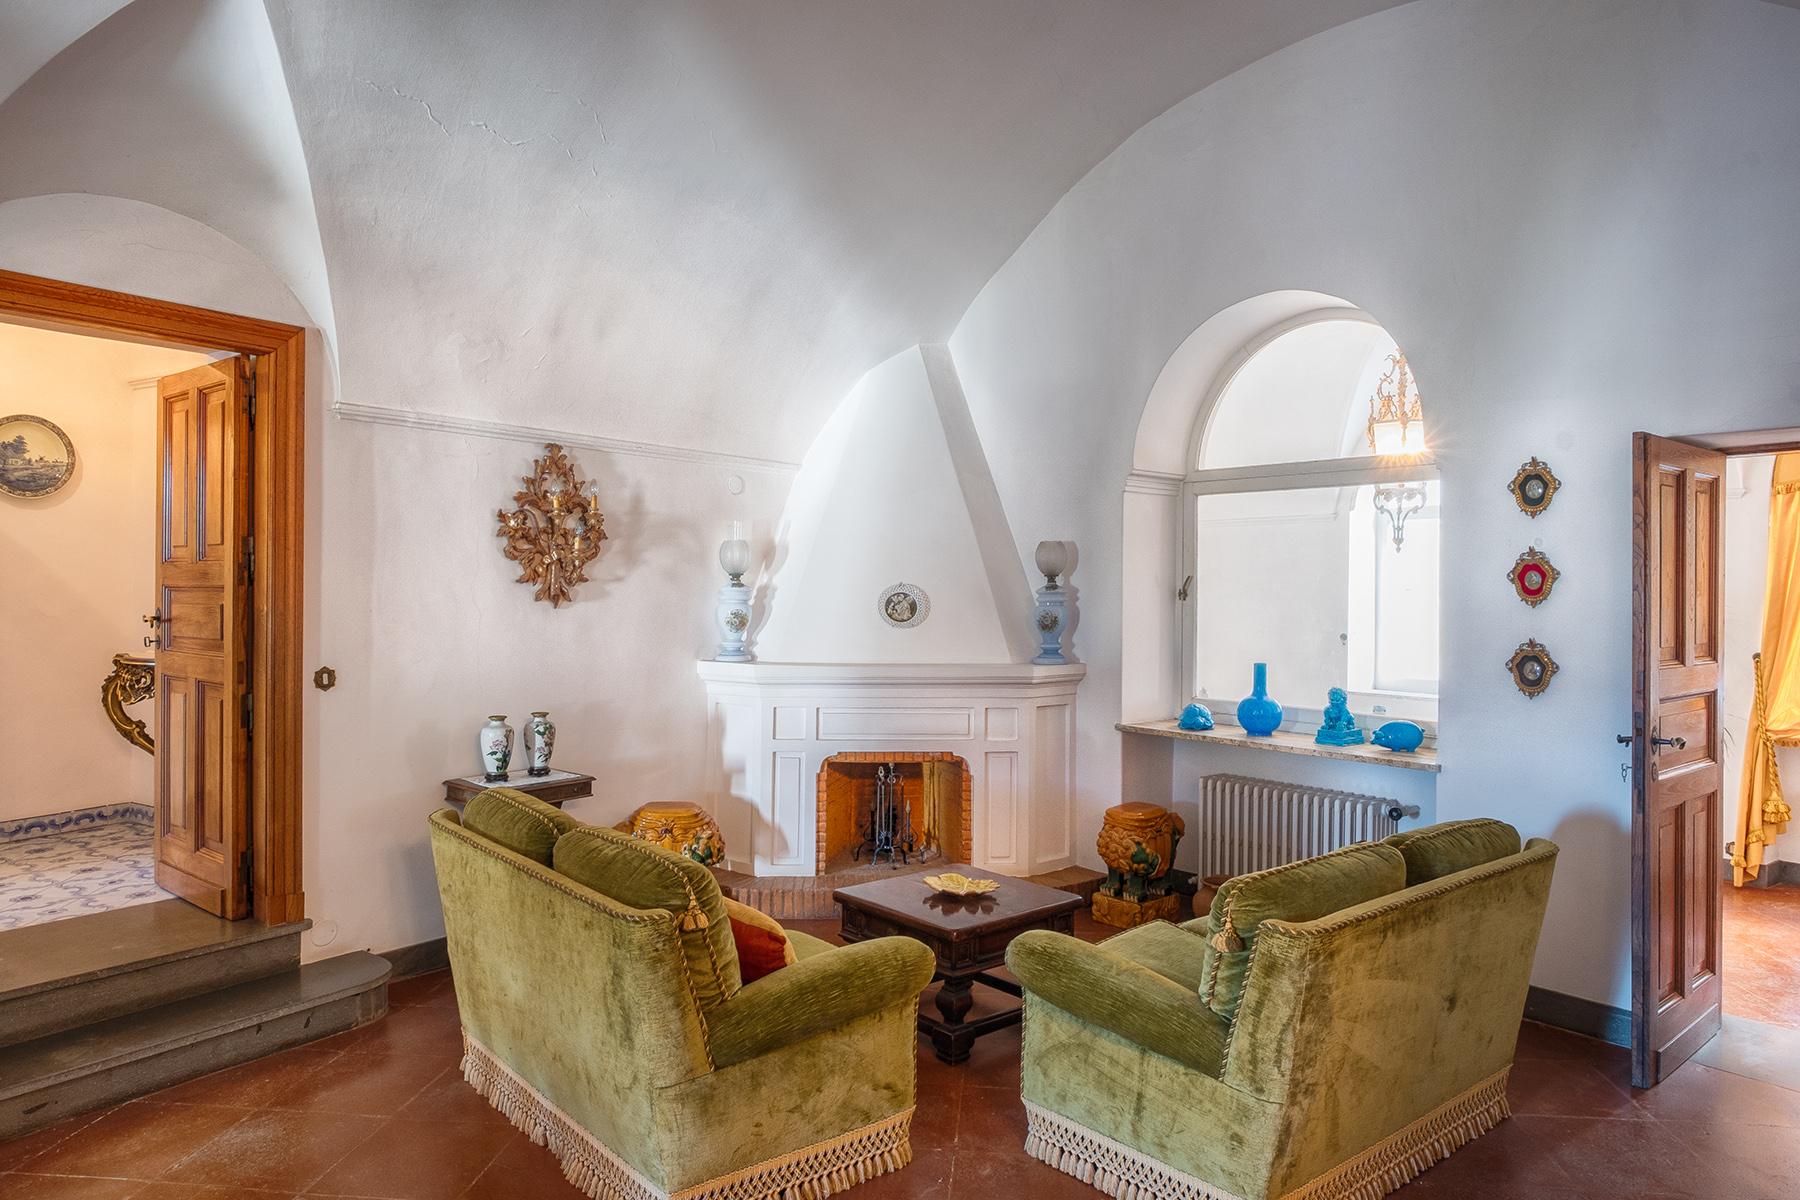 Casa indipendente in Vendita a Capri: 5 locali, 400 mq - Foto 9